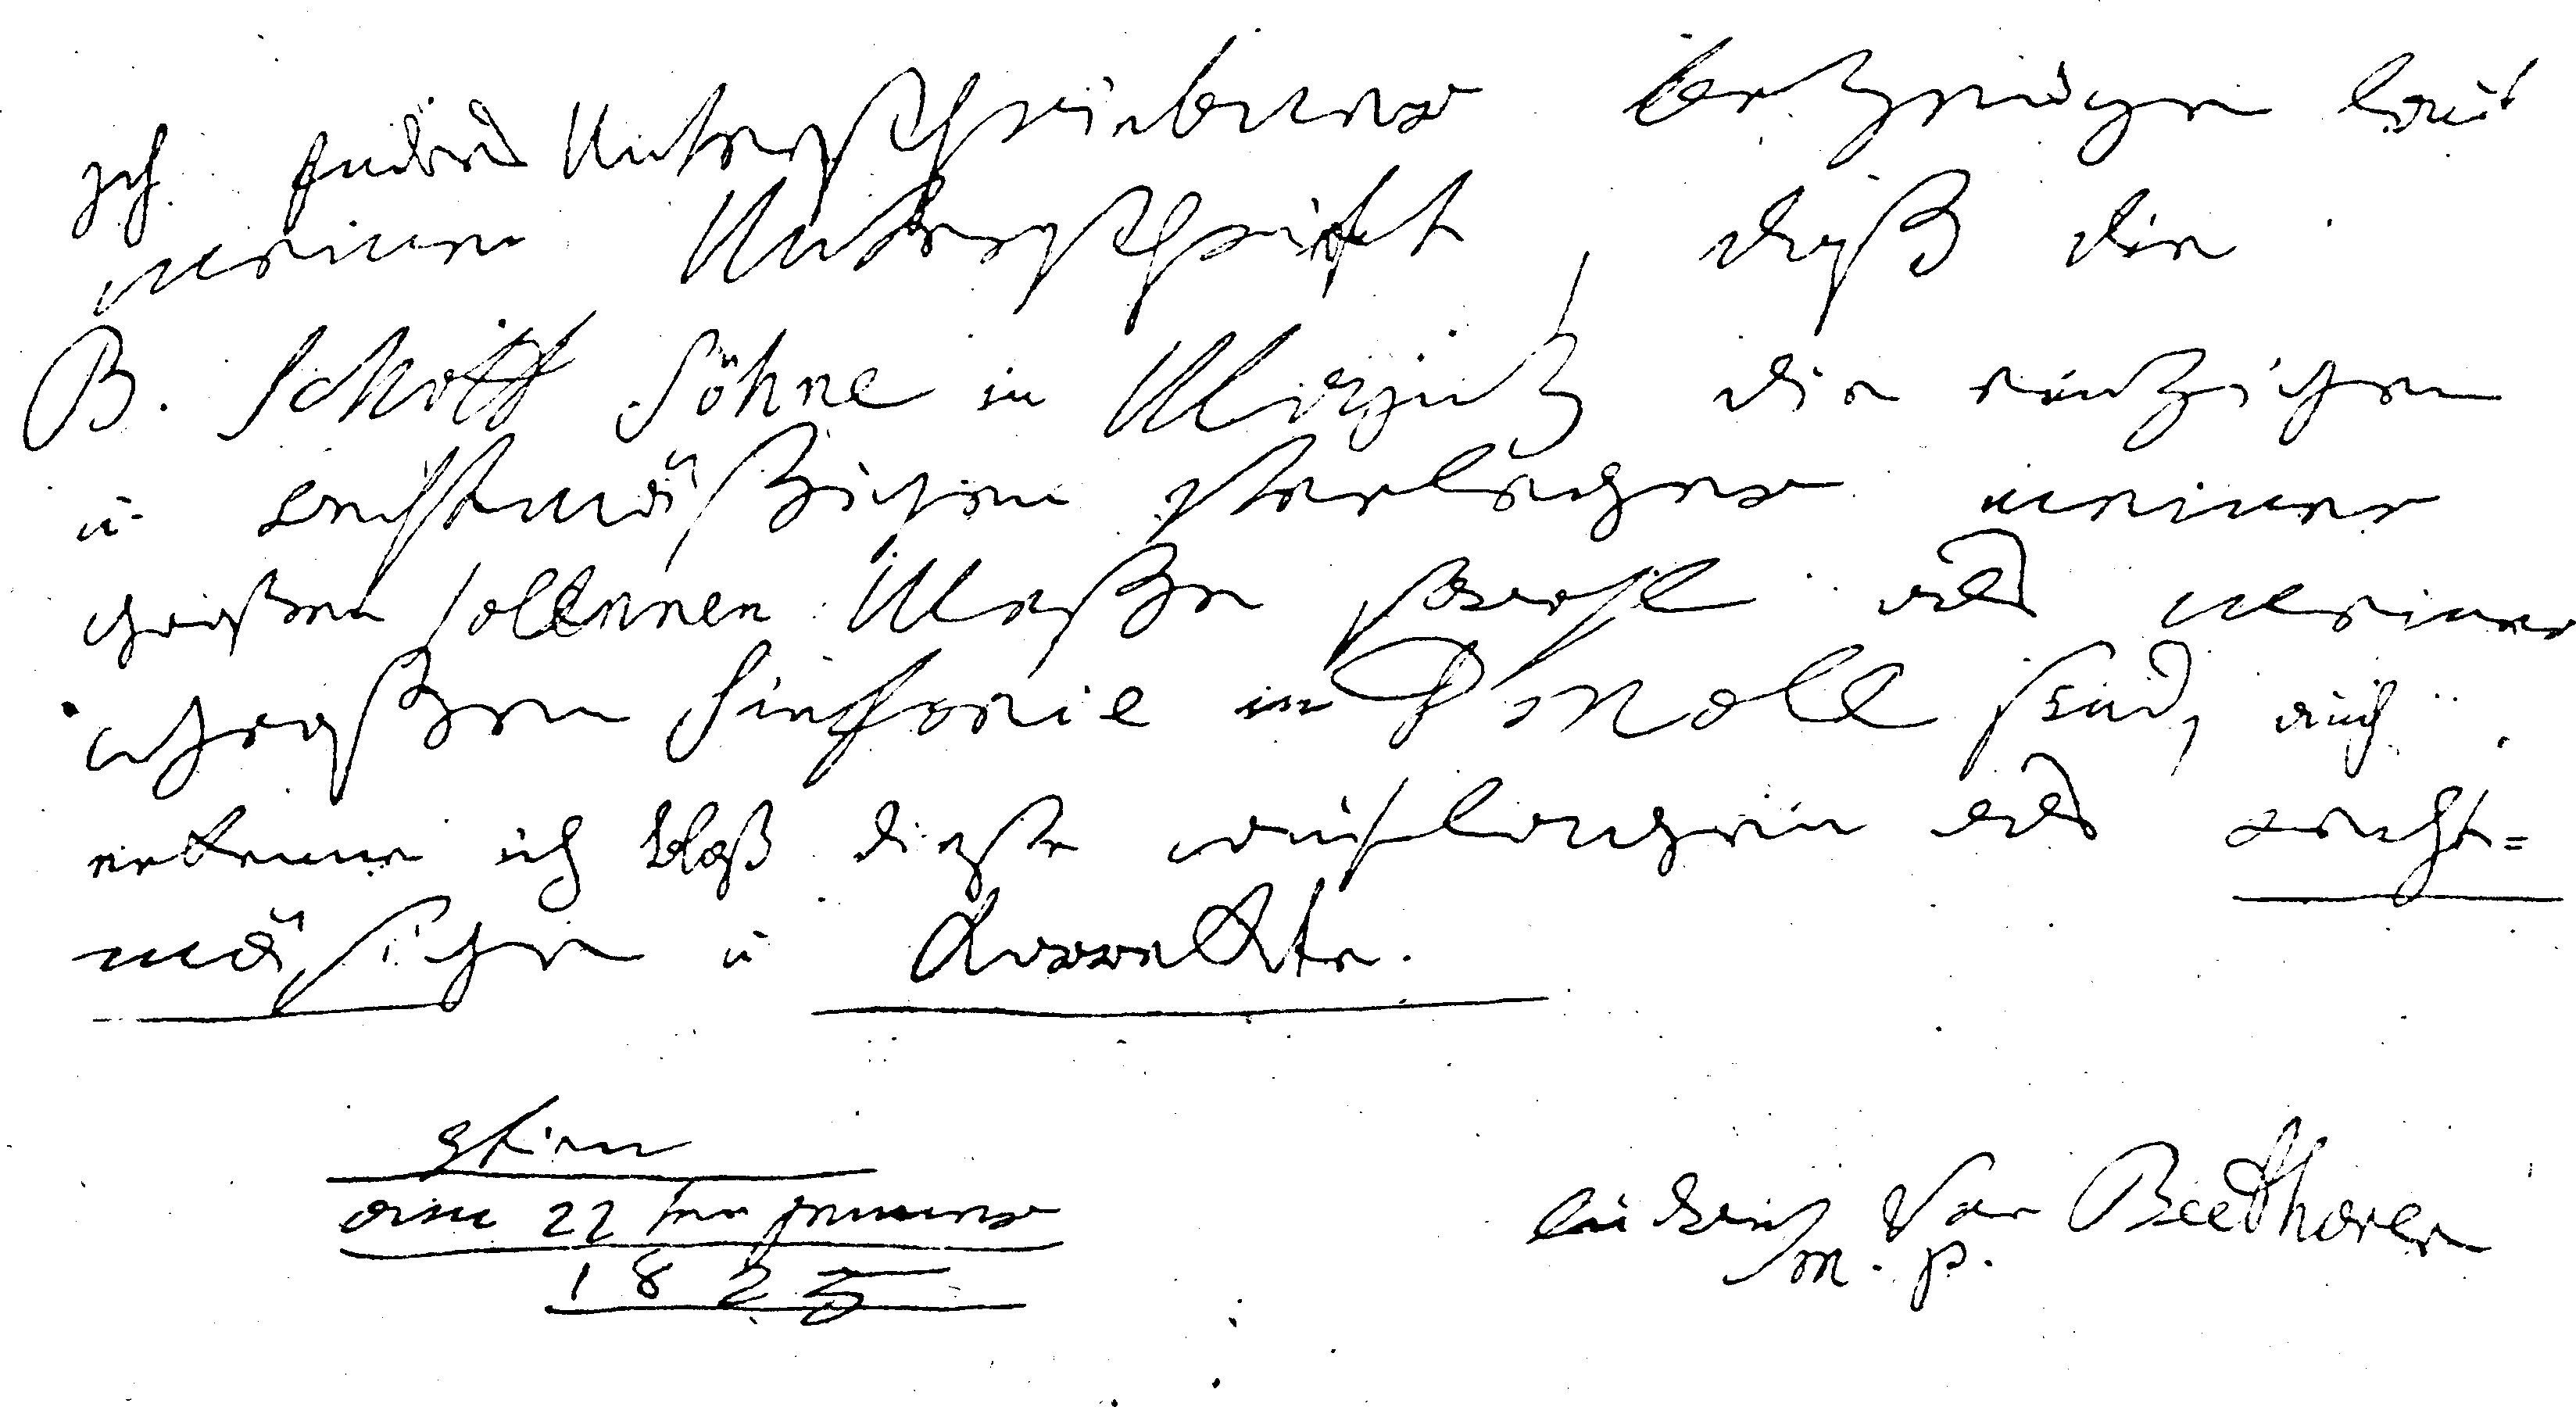 Briefe Beethoven : File beethoven symphonie missa solemnis autorisation